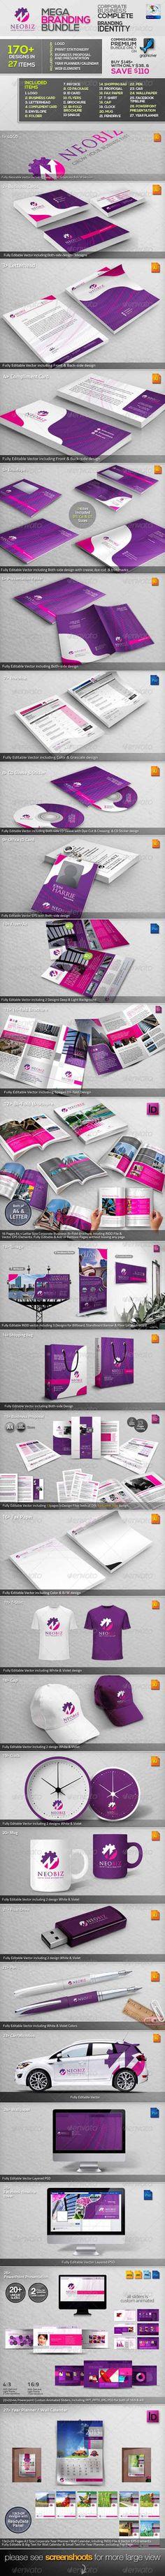 GraphicRiver  NeoBiz: Corporate Business ID Mega Branding Bundle 3427614 Free Download